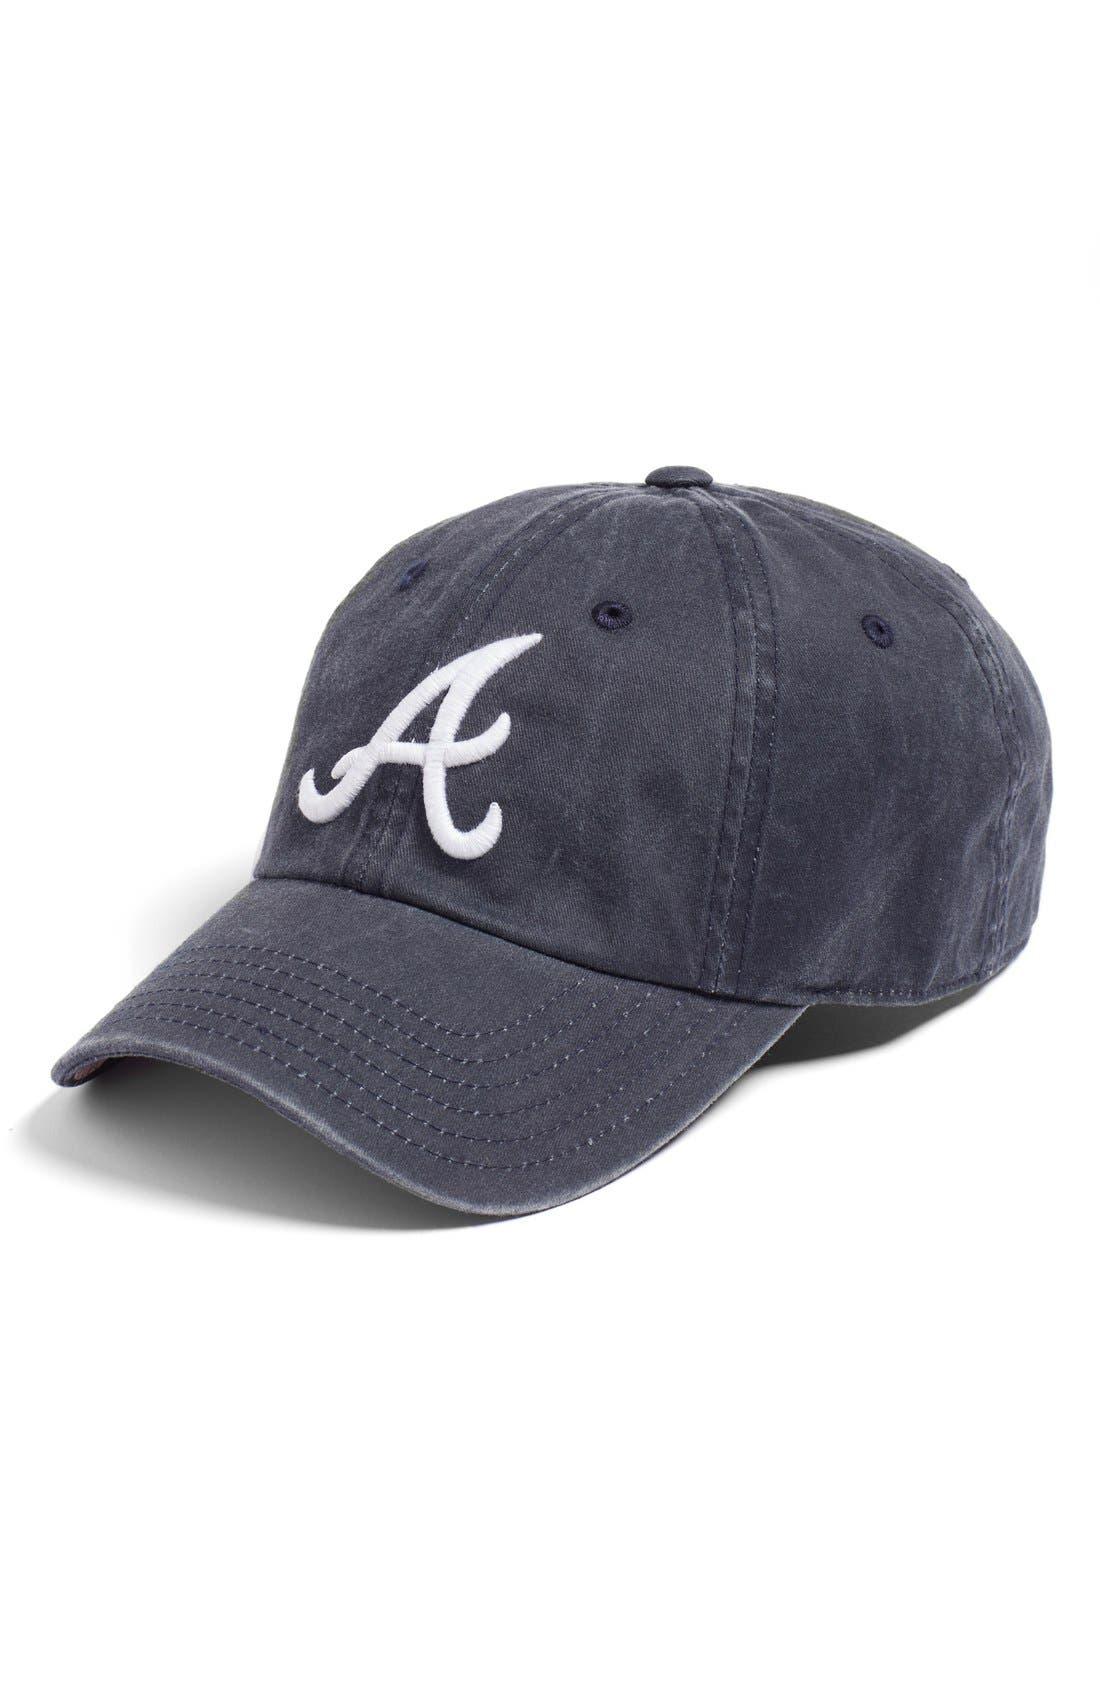 New Raglan - Atlanta Braves Baseball Cap,                             Main thumbnail 1, color,                             400